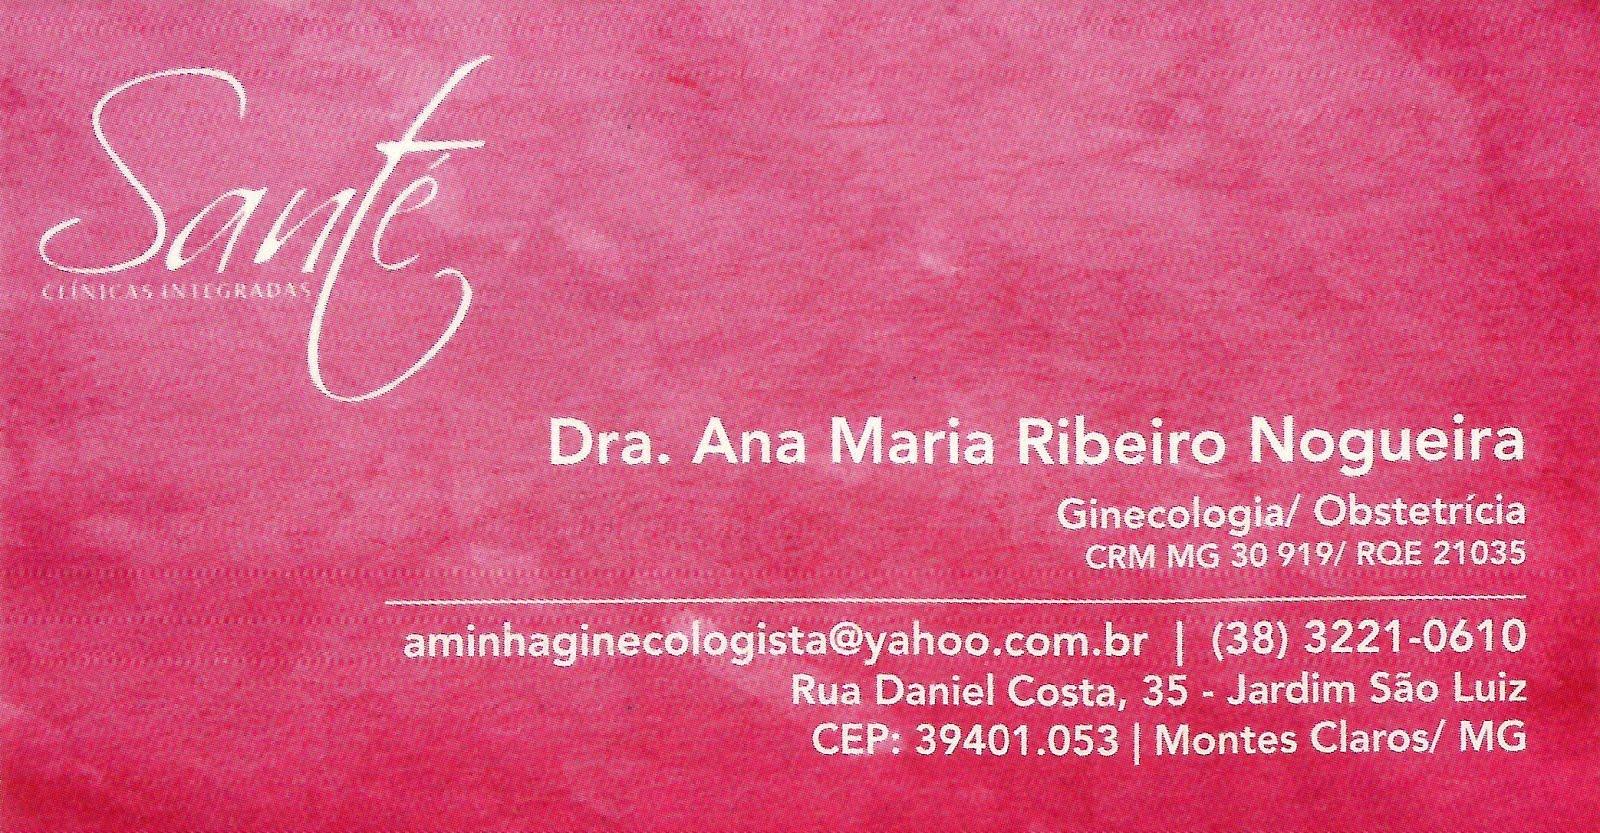 Dra. Ana Maria Ribeiro Nogueira